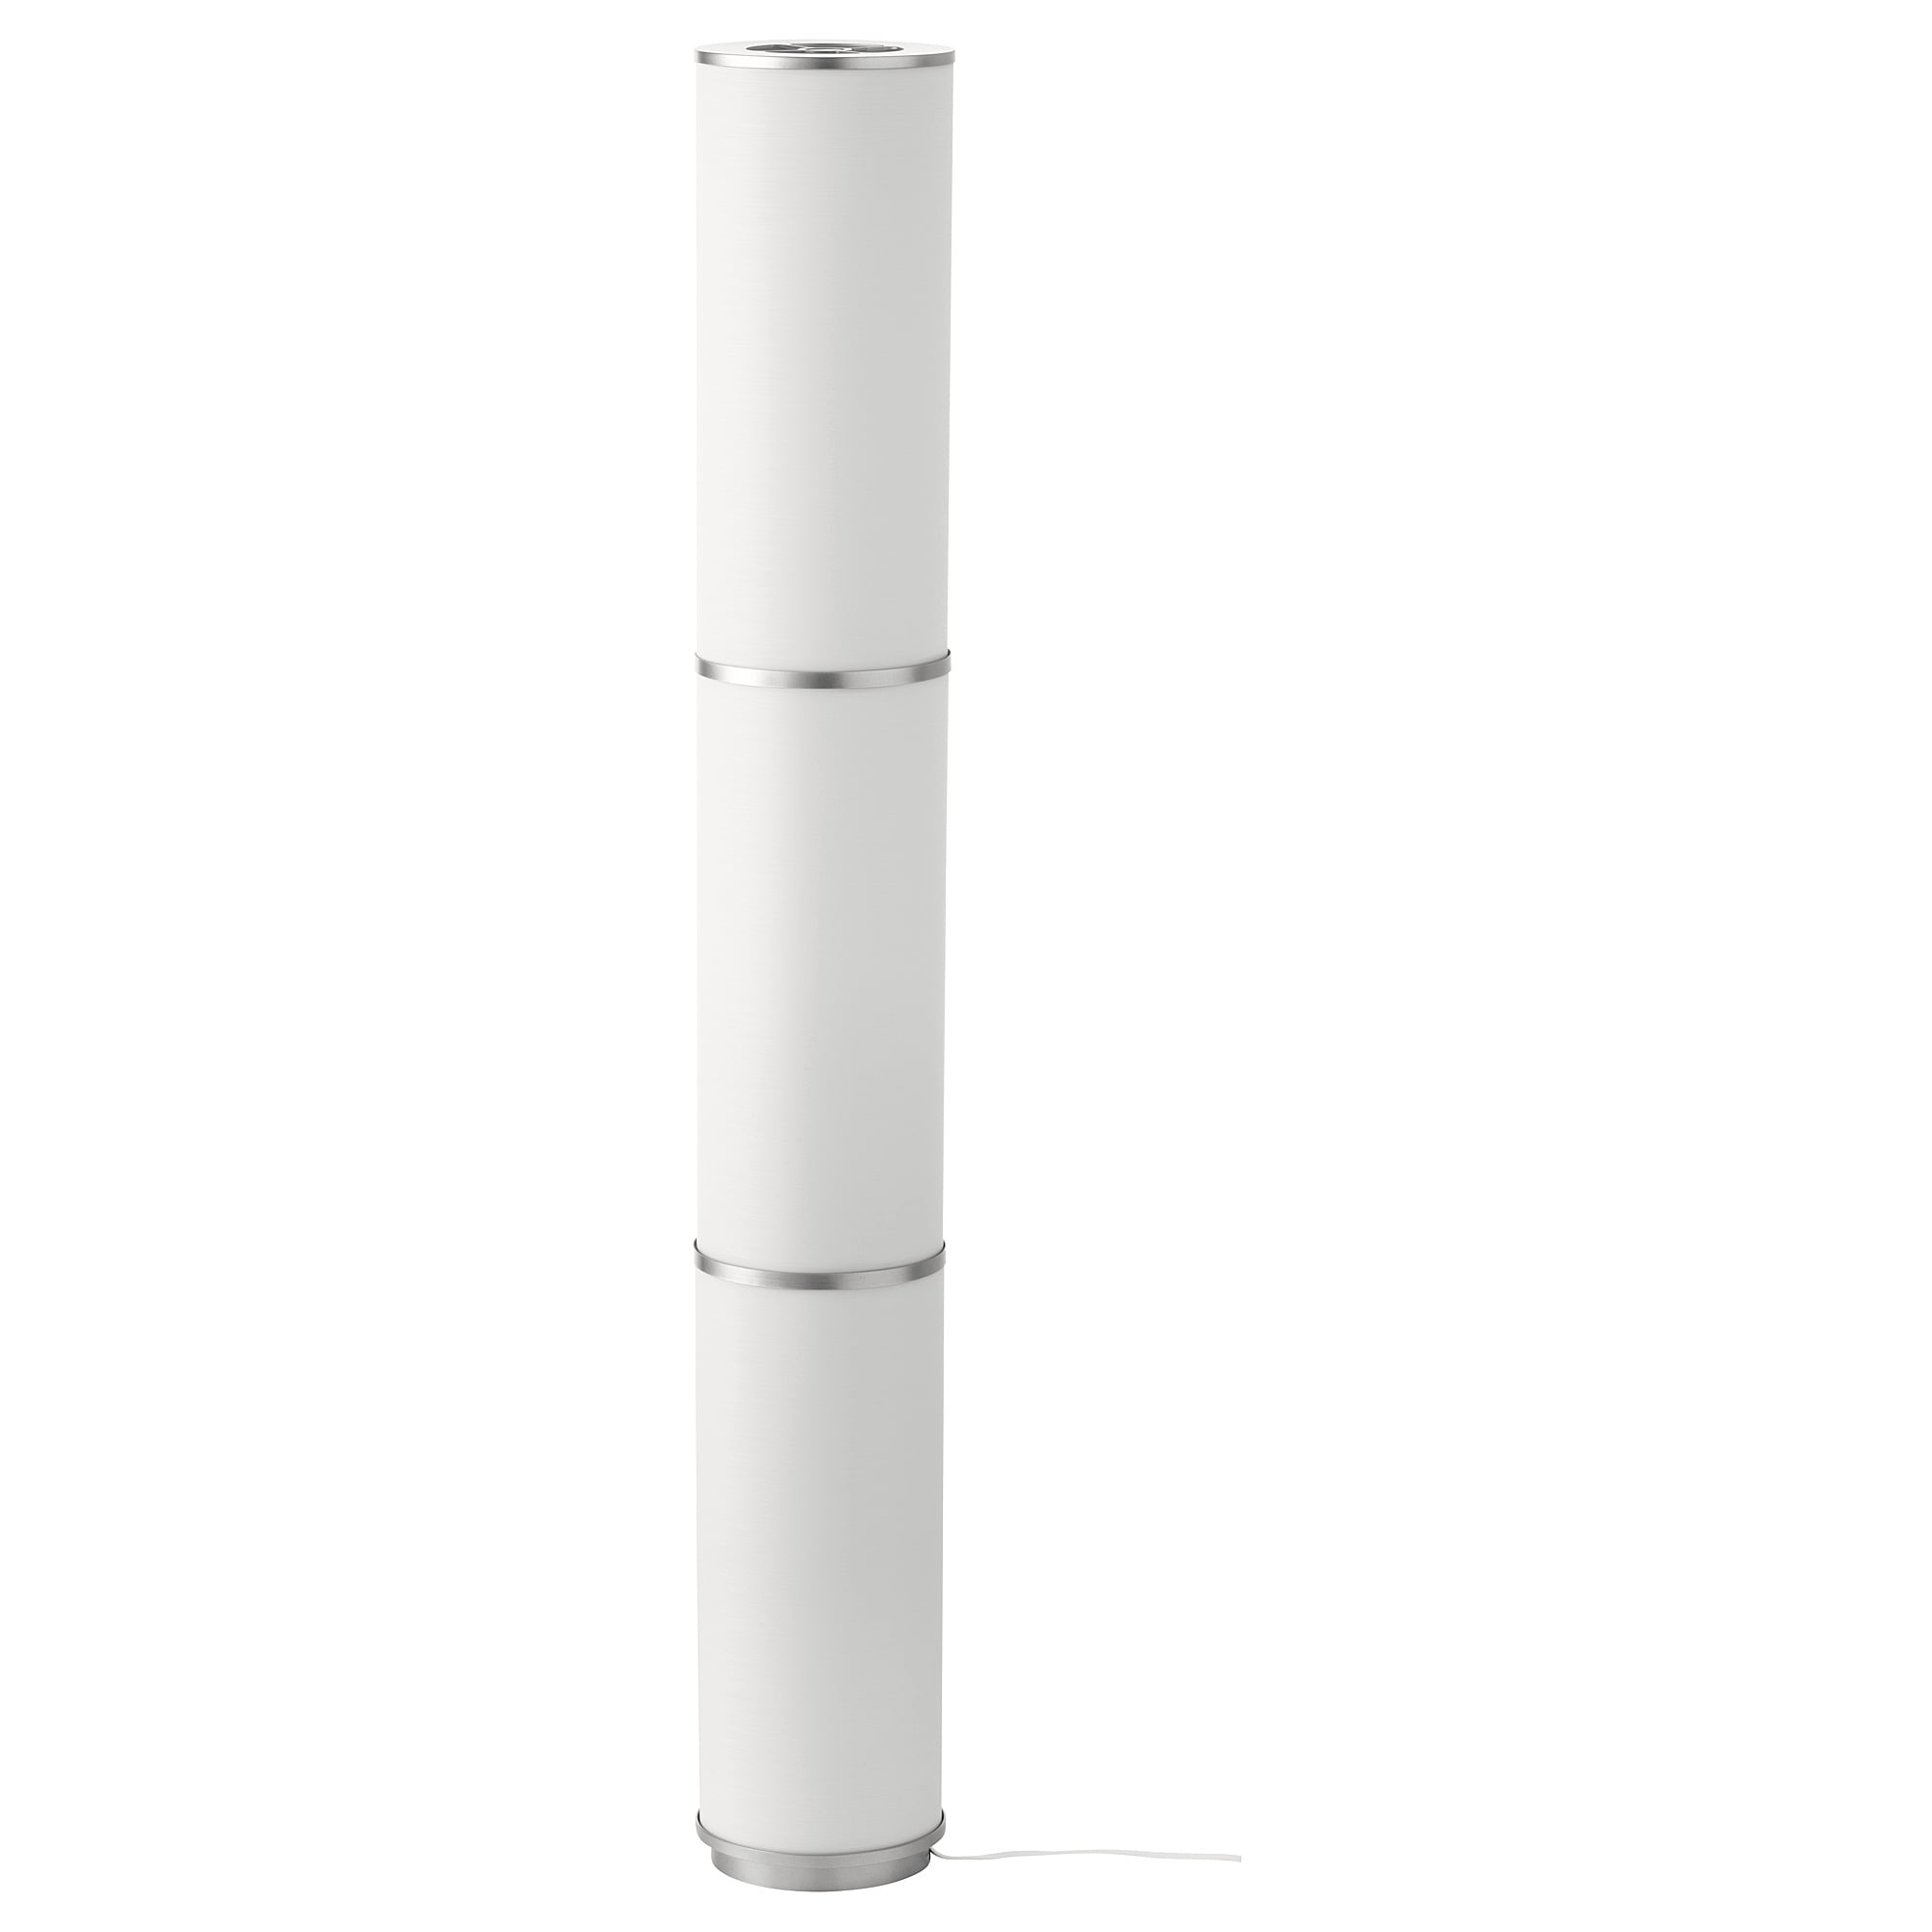 Vidja Standleuchte Weiss Ikea Deutschland White Floor Lamp Floor Lamp Clear Light Bulbs